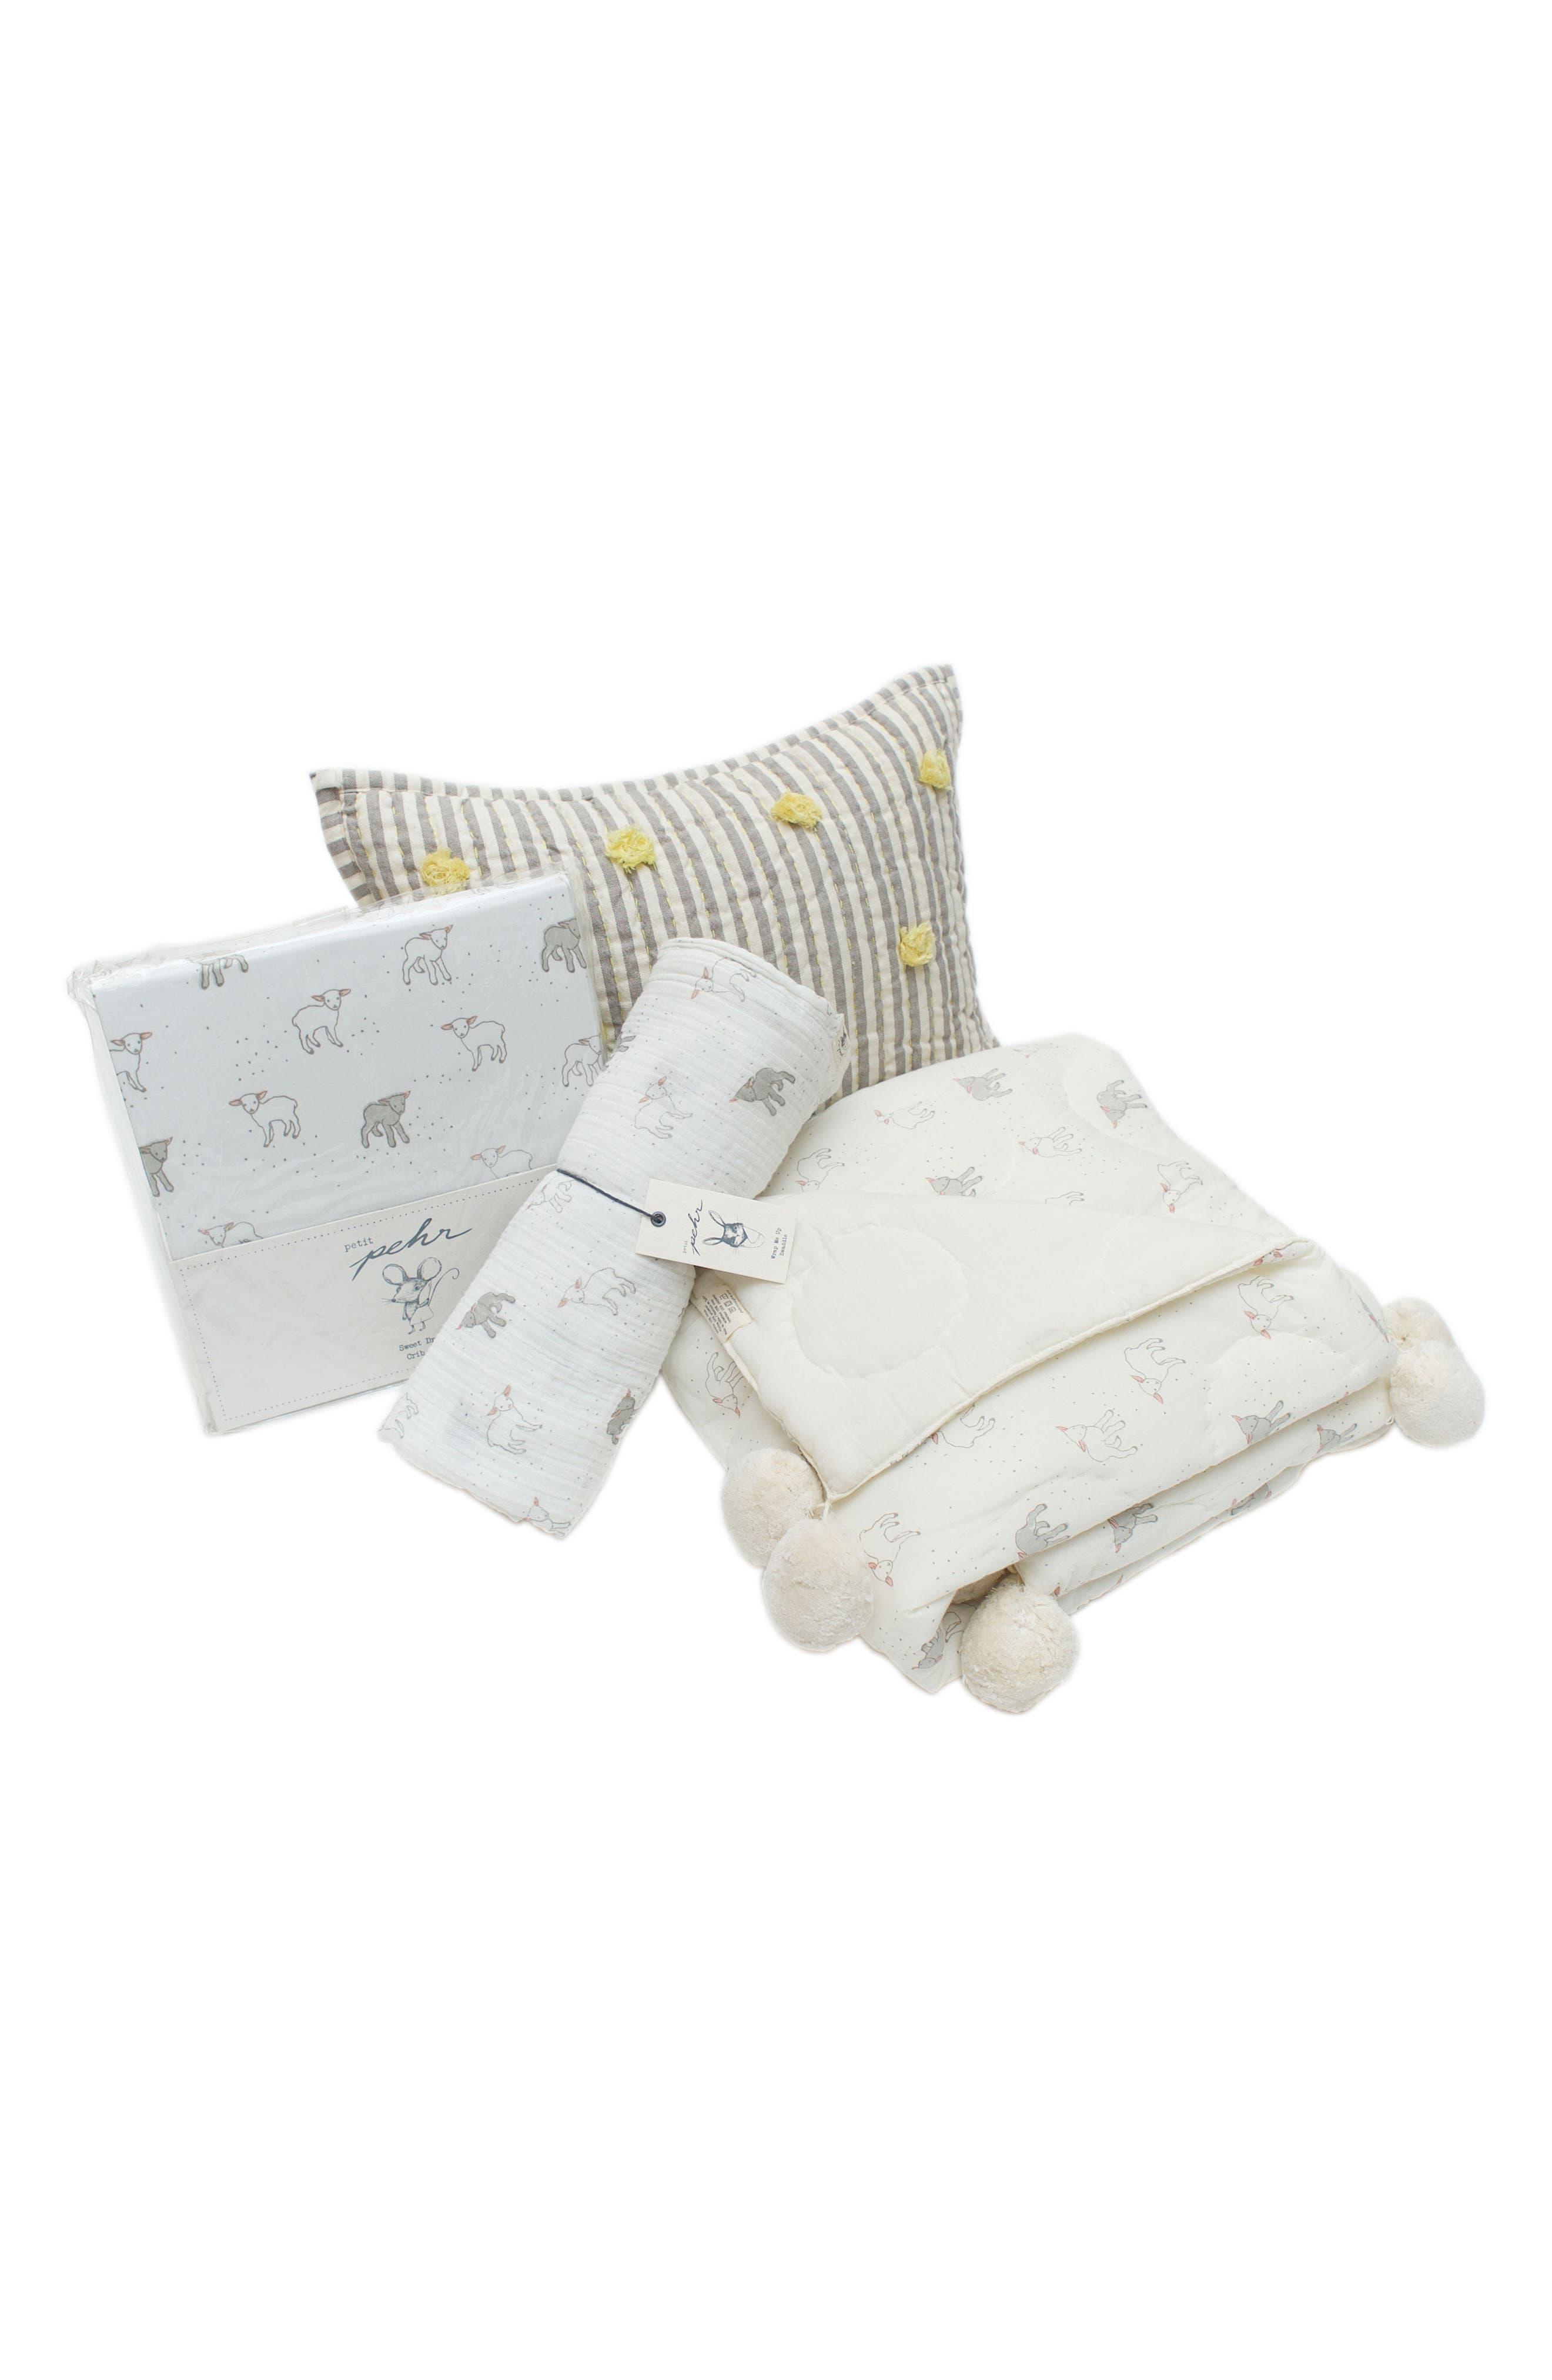 Petit Pehr Showers Crib Sheet, Swaddle, Blanket & Pillow Set (Baby)